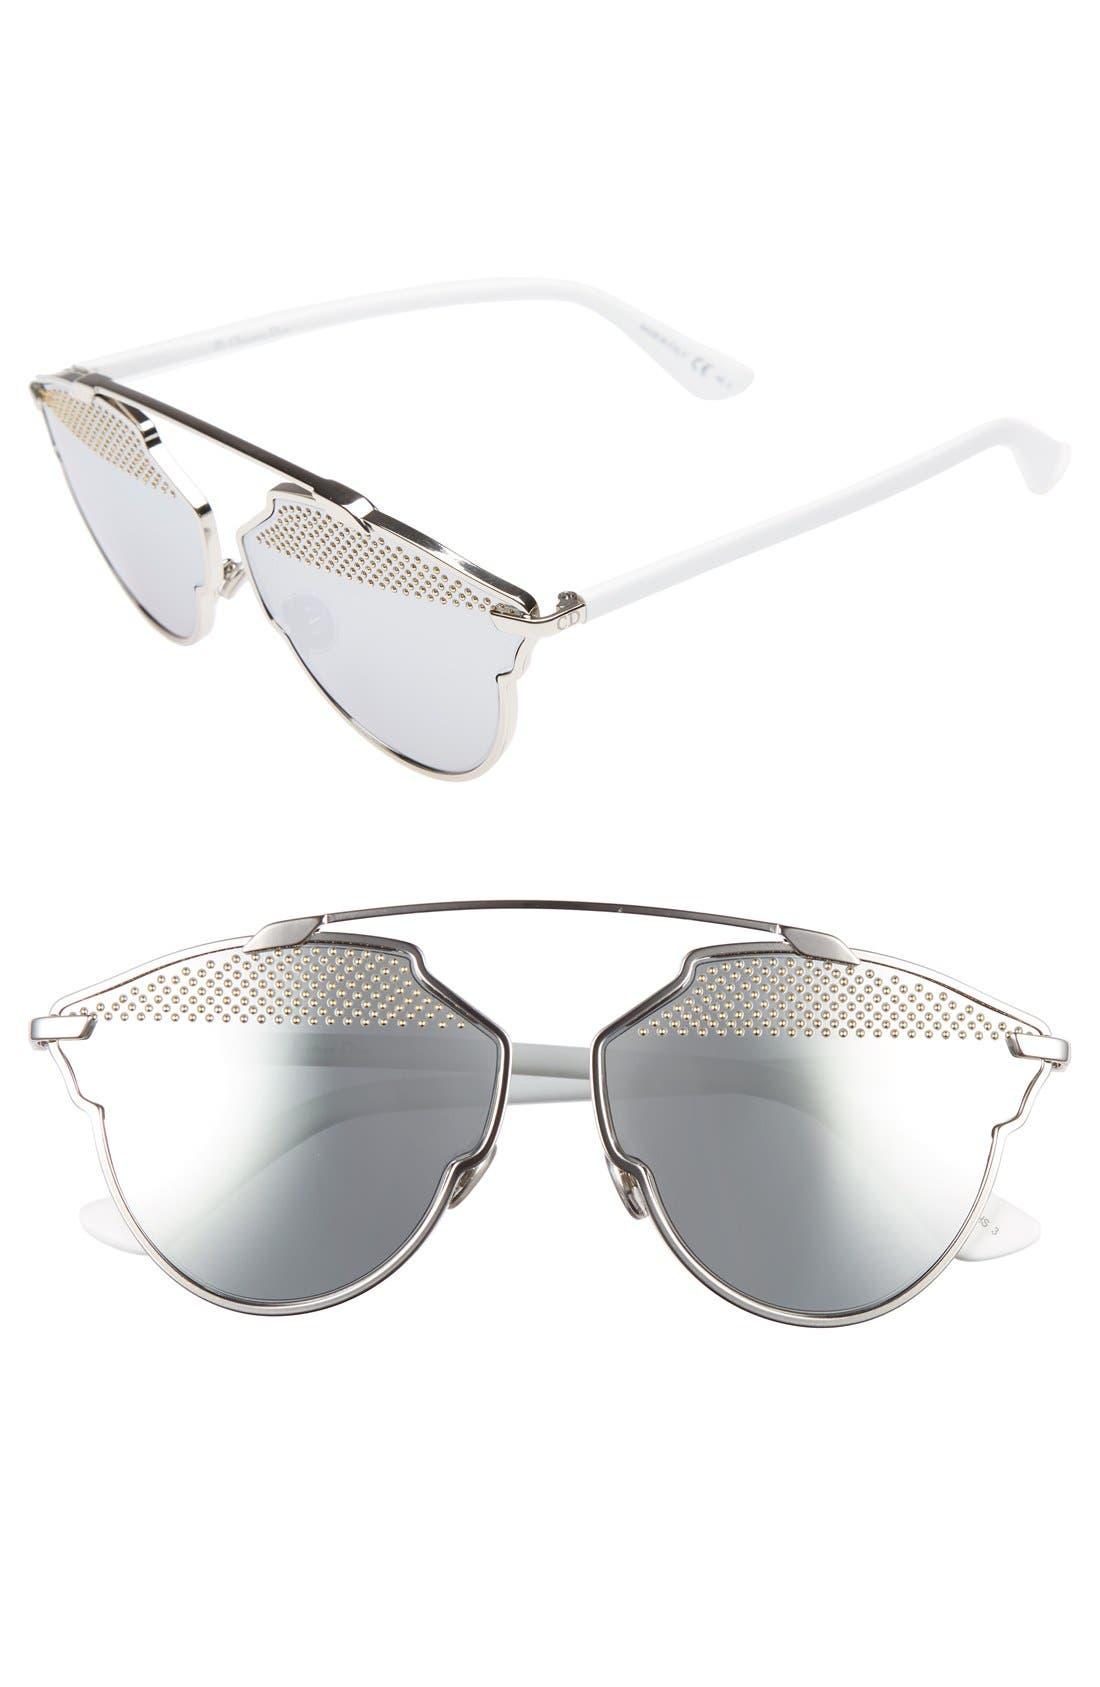 Main Image - Dior So Real Studded 59mm Brow Bar Sunglasses